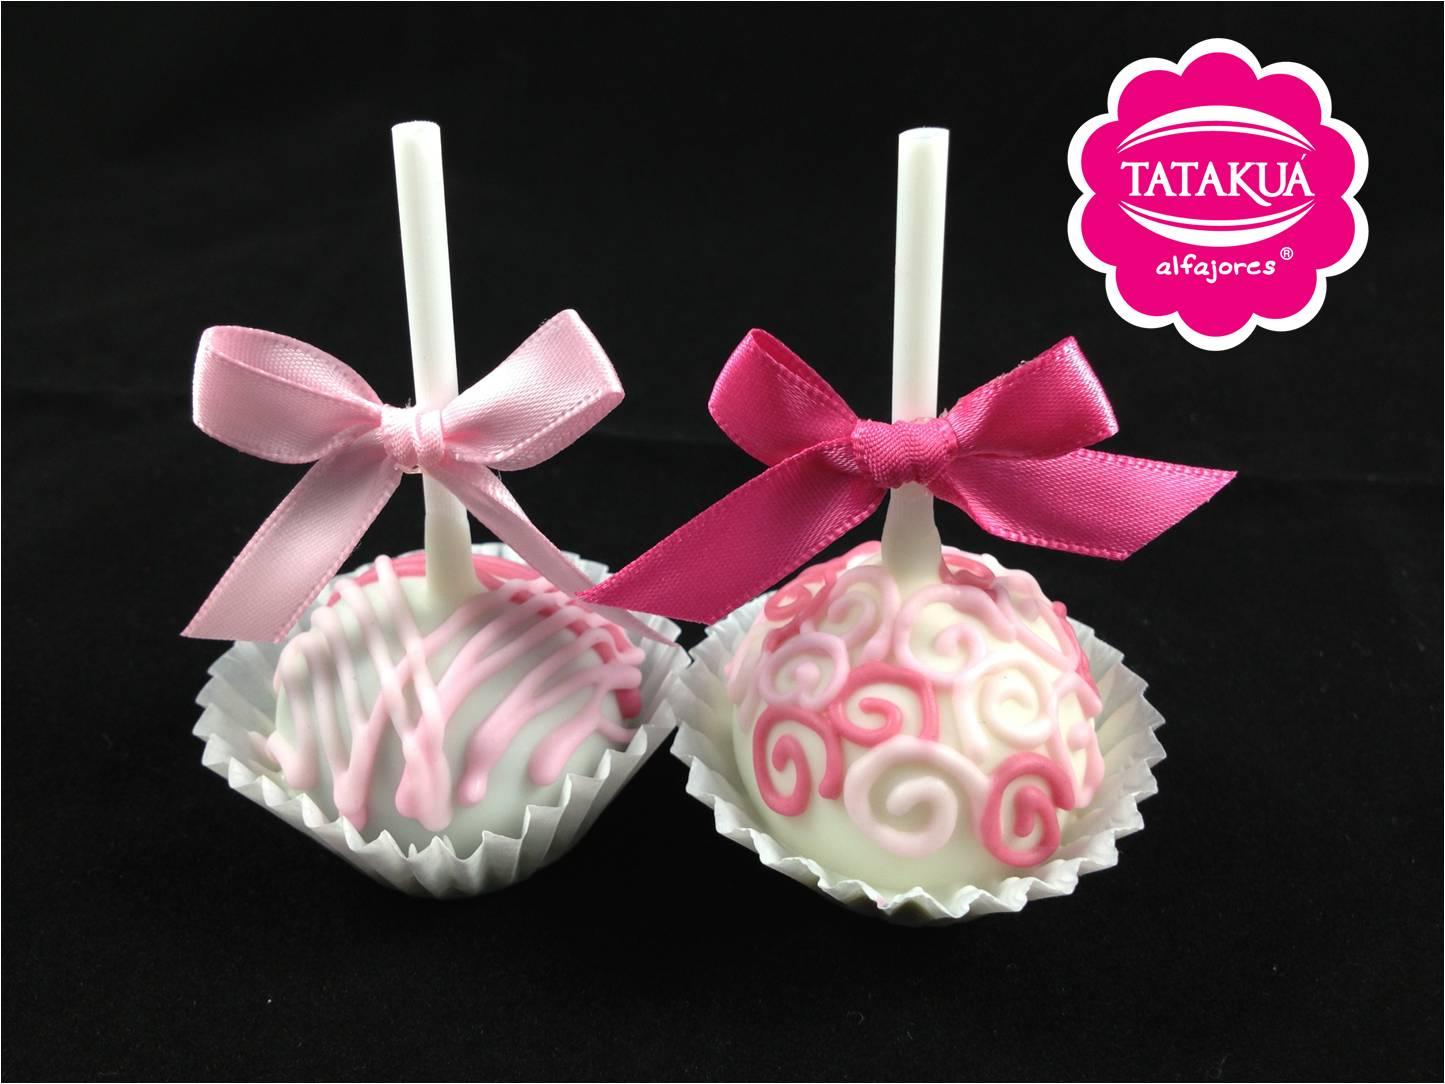 Cake Pops Tataku 225 Alfajores